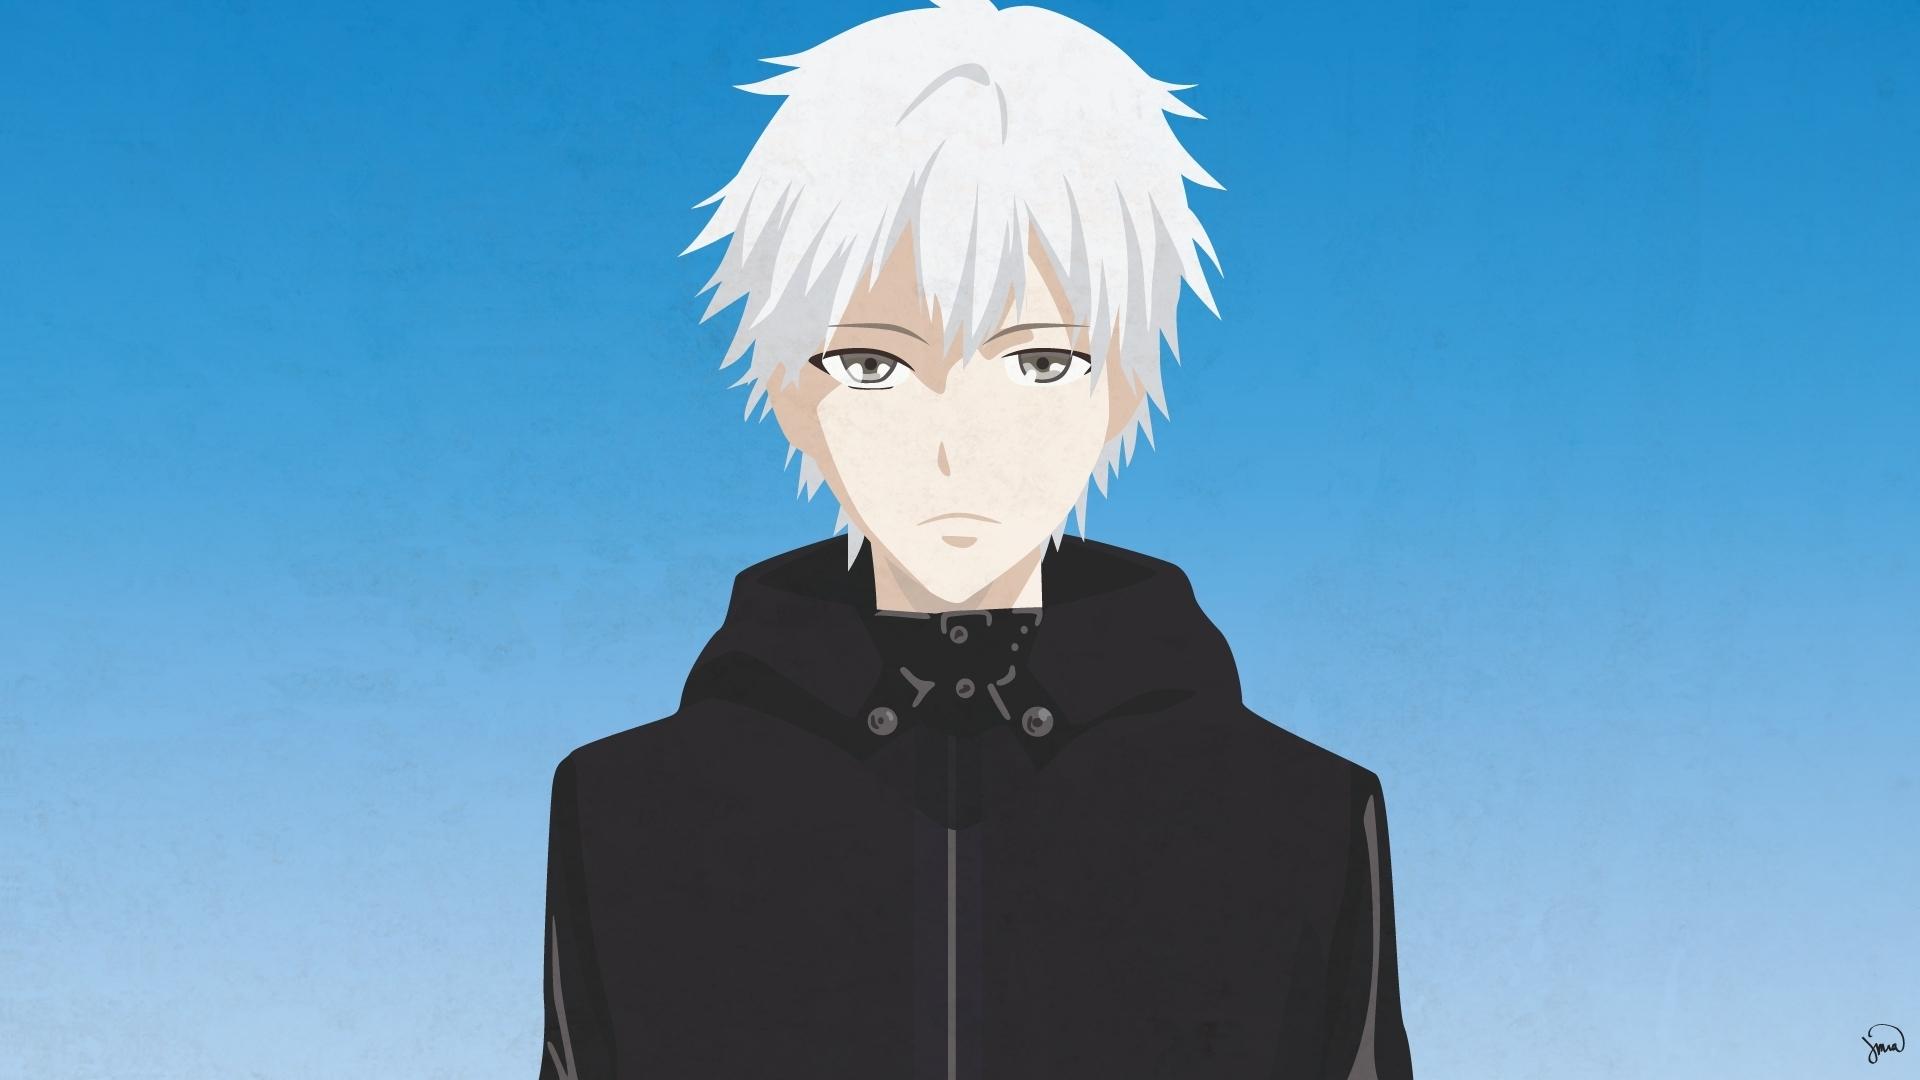 Ken Kaneki Tokyo Ghoul 2496152 Hd Wallpaper Backgrounds Download